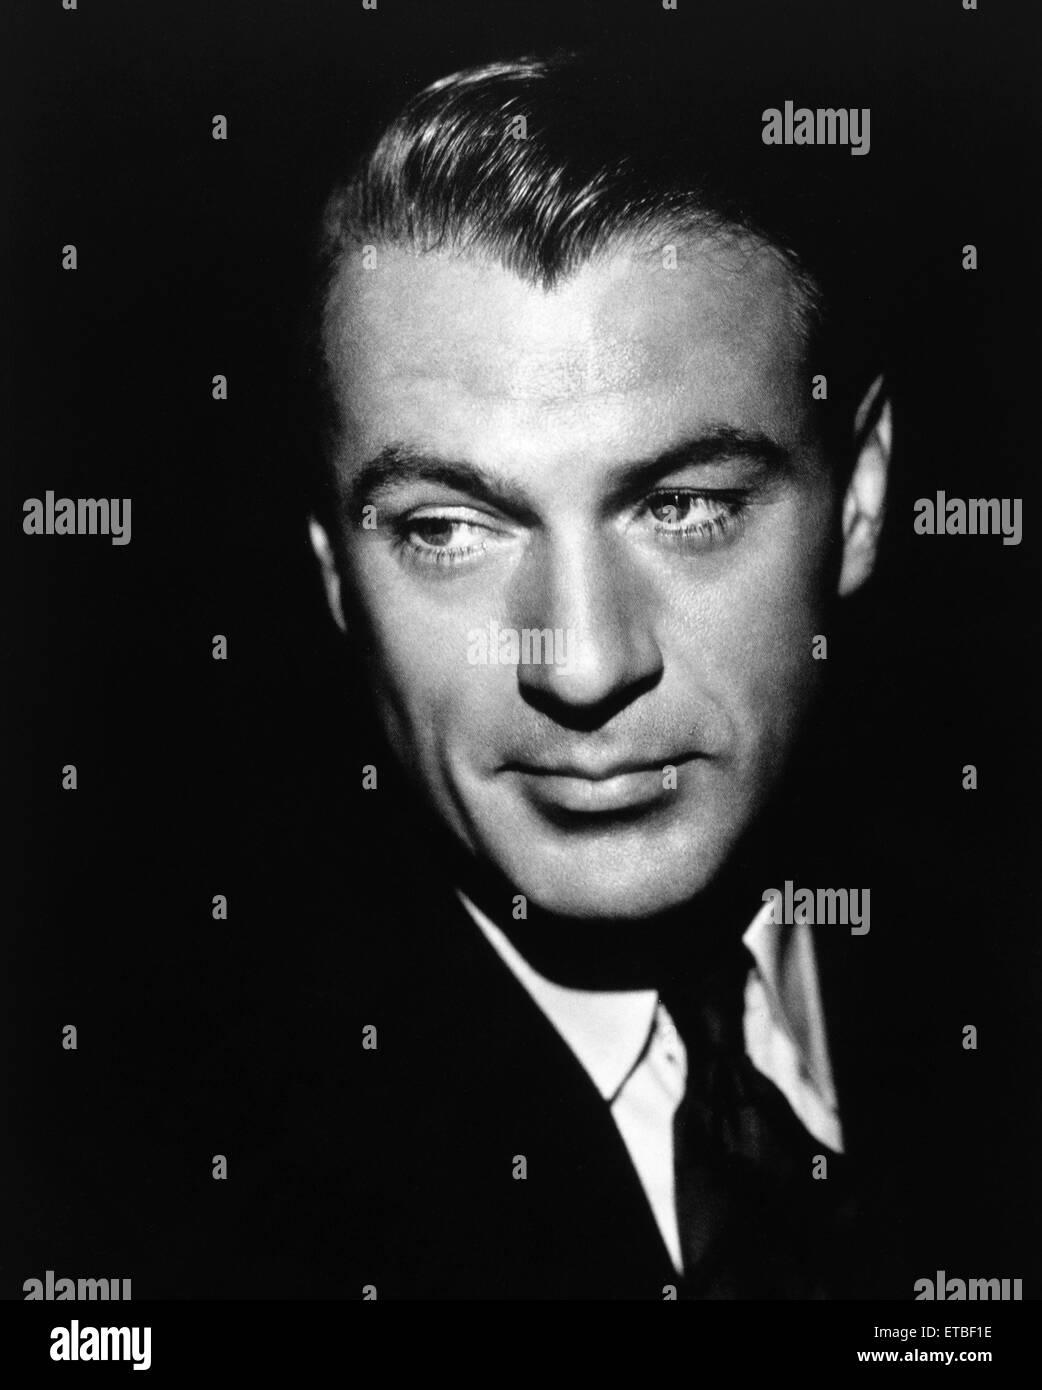 Actor Gary Cooper, Portrait, 1941 - Stock Image